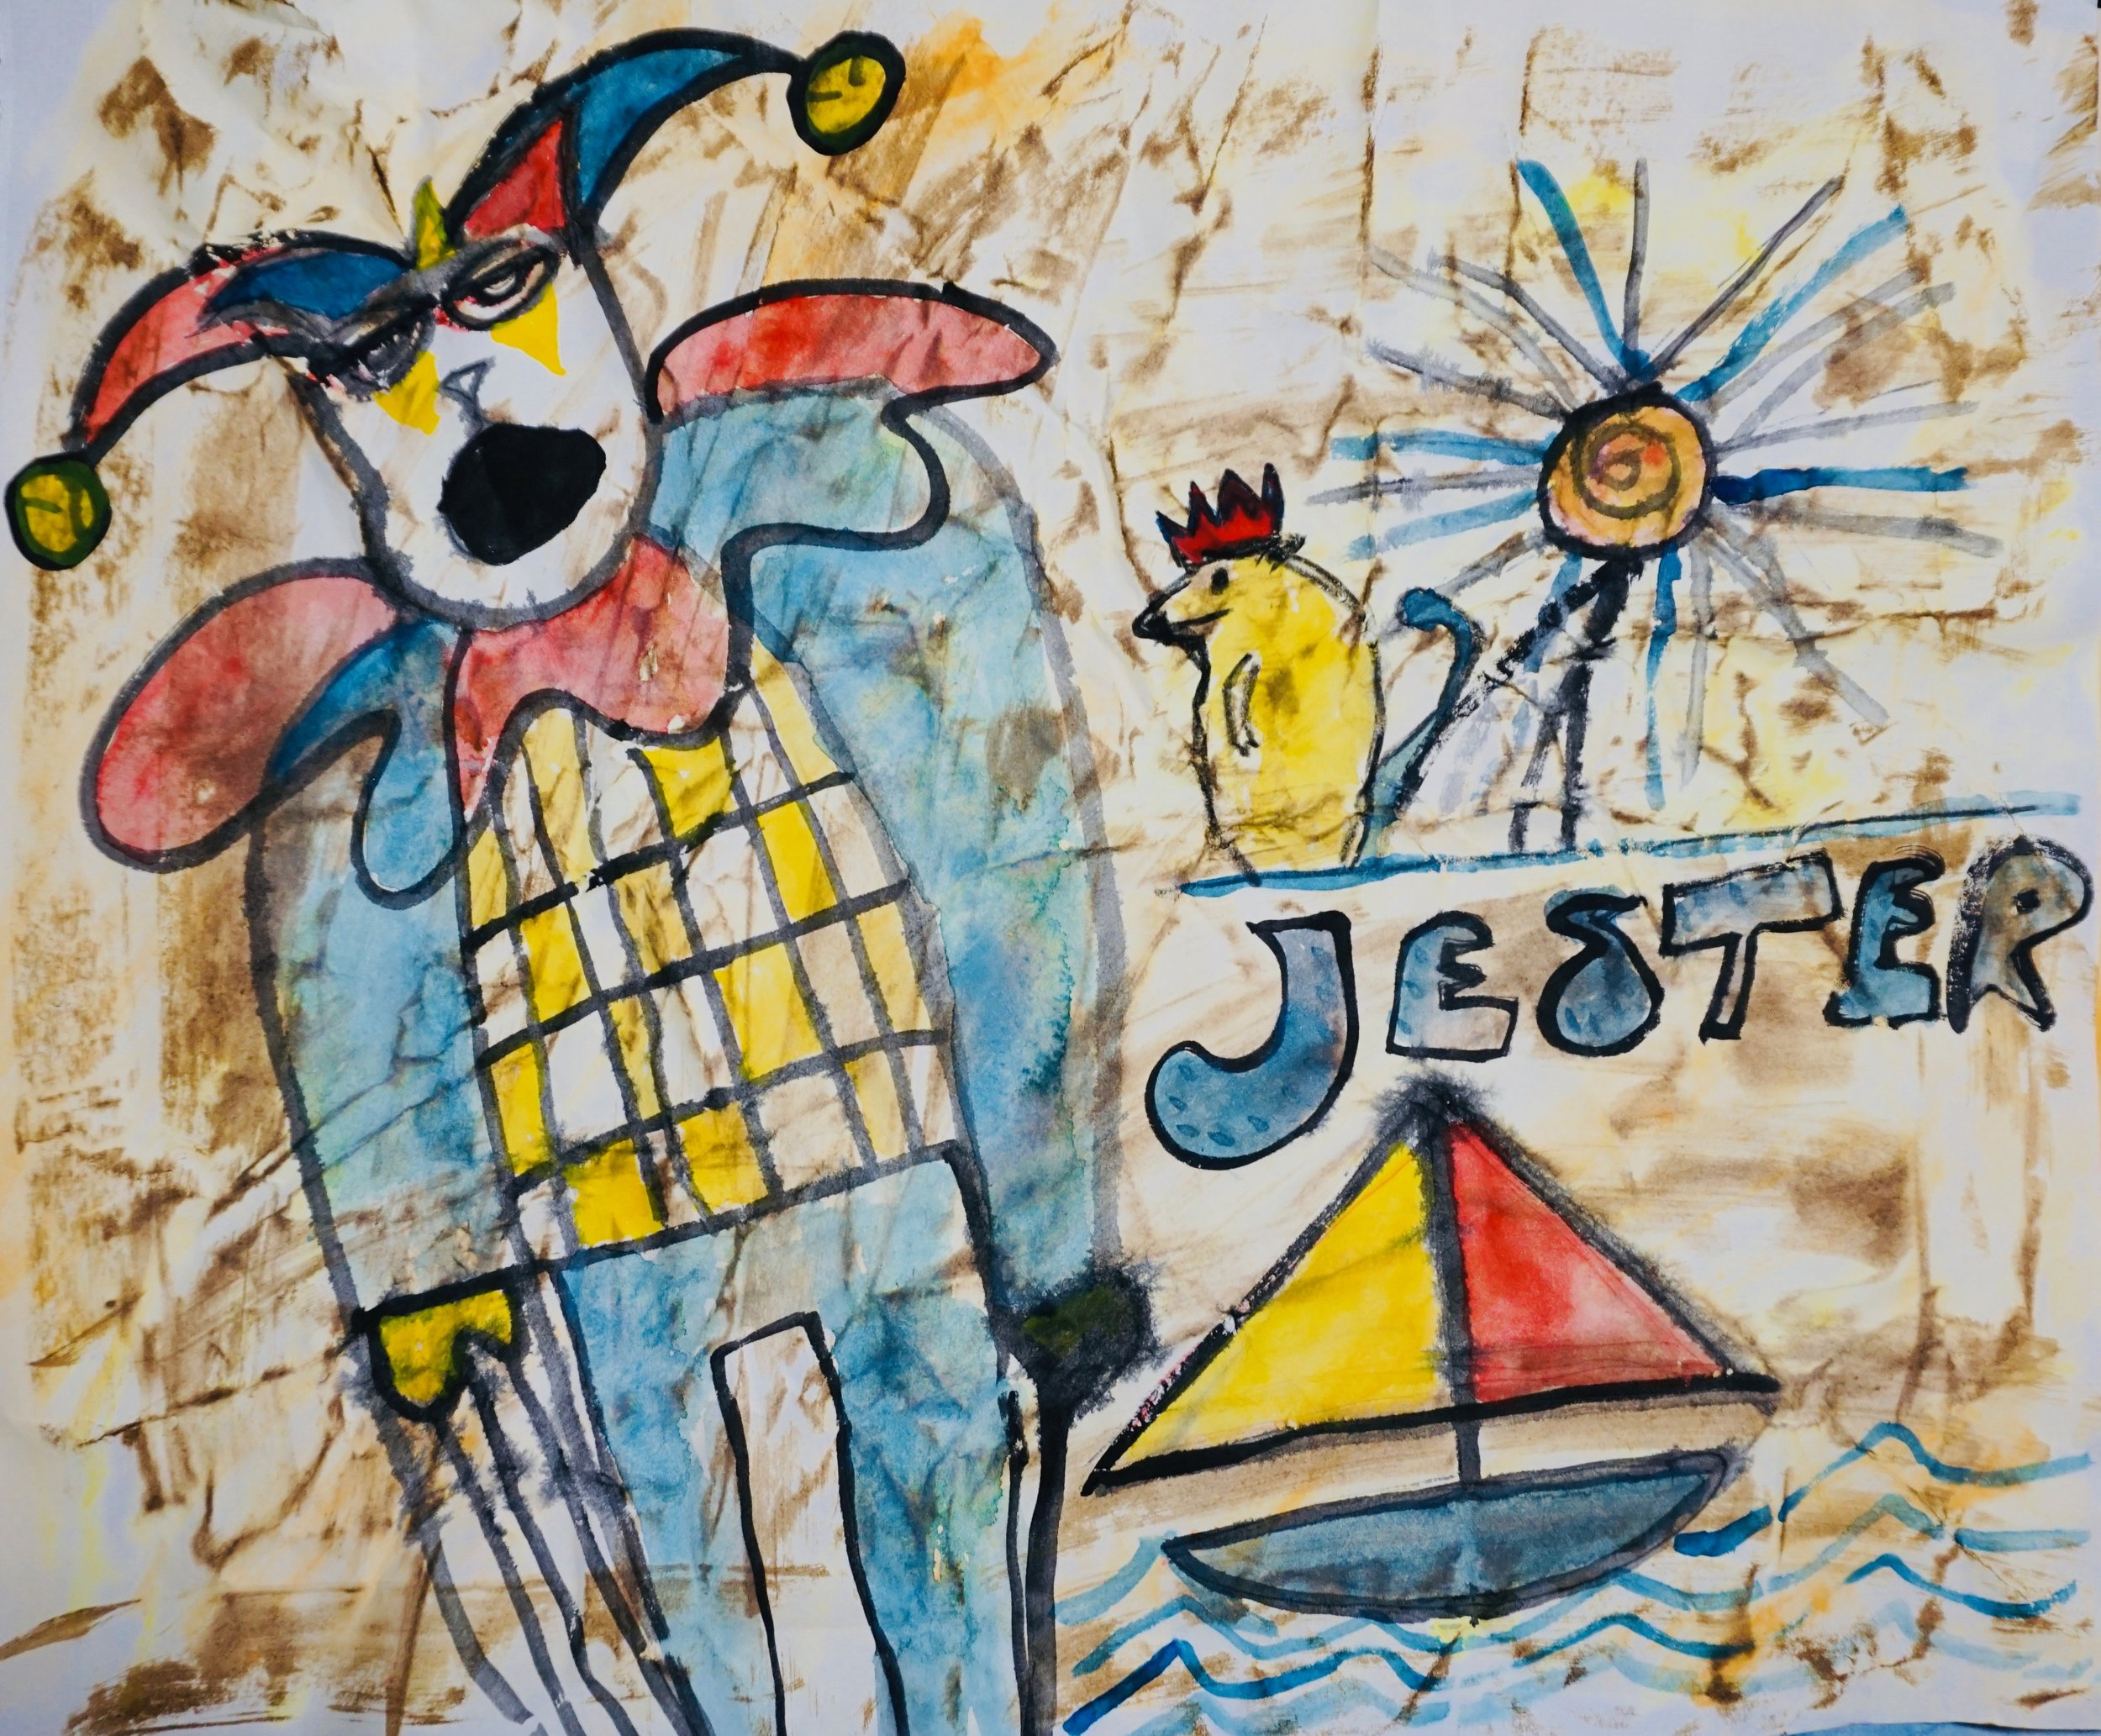 Jester by Kathryn Sturges